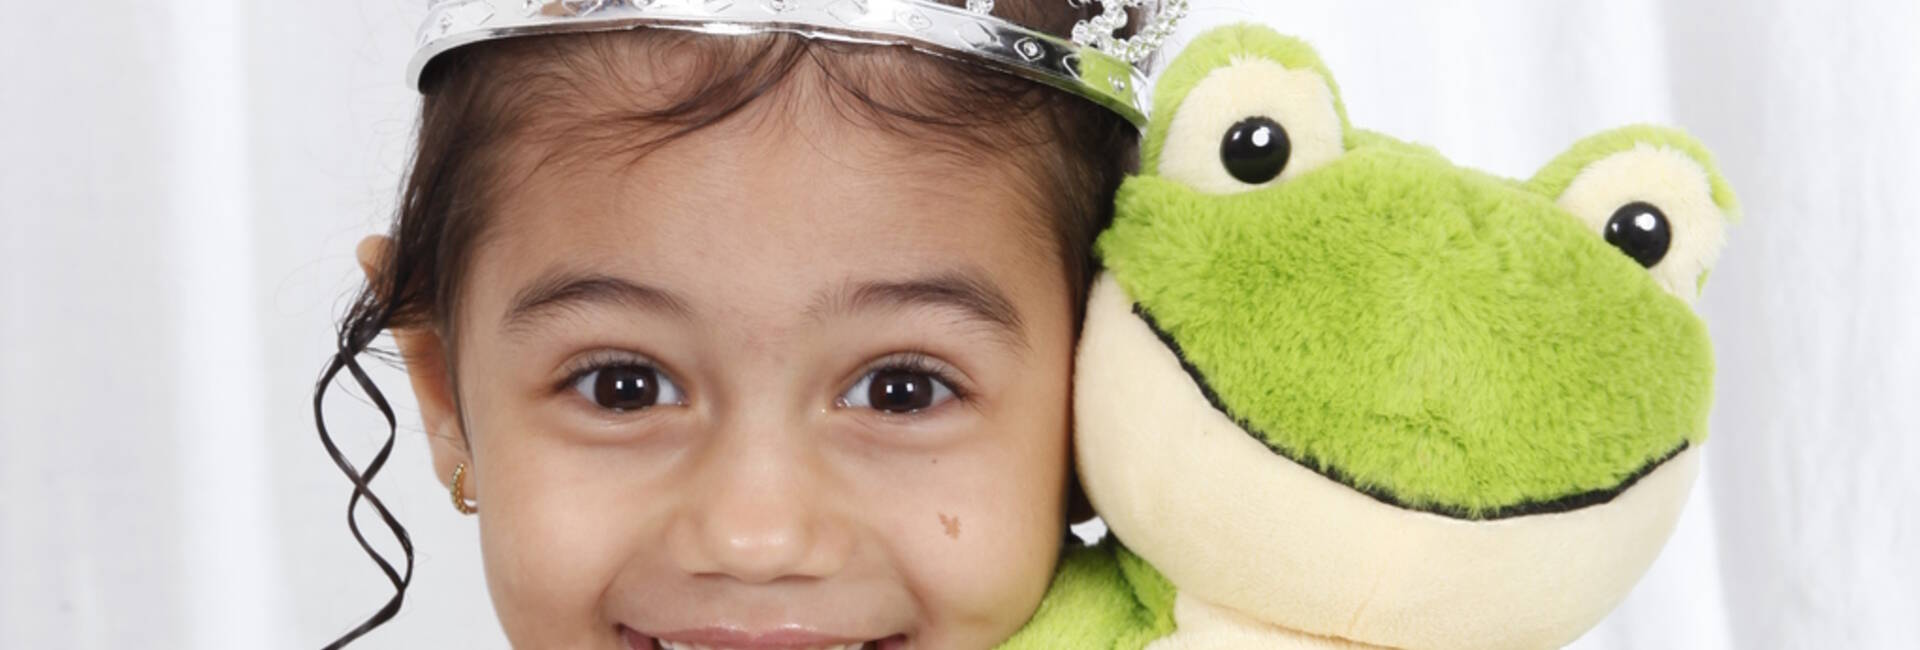 Book Infantil de A princesa e o sapo